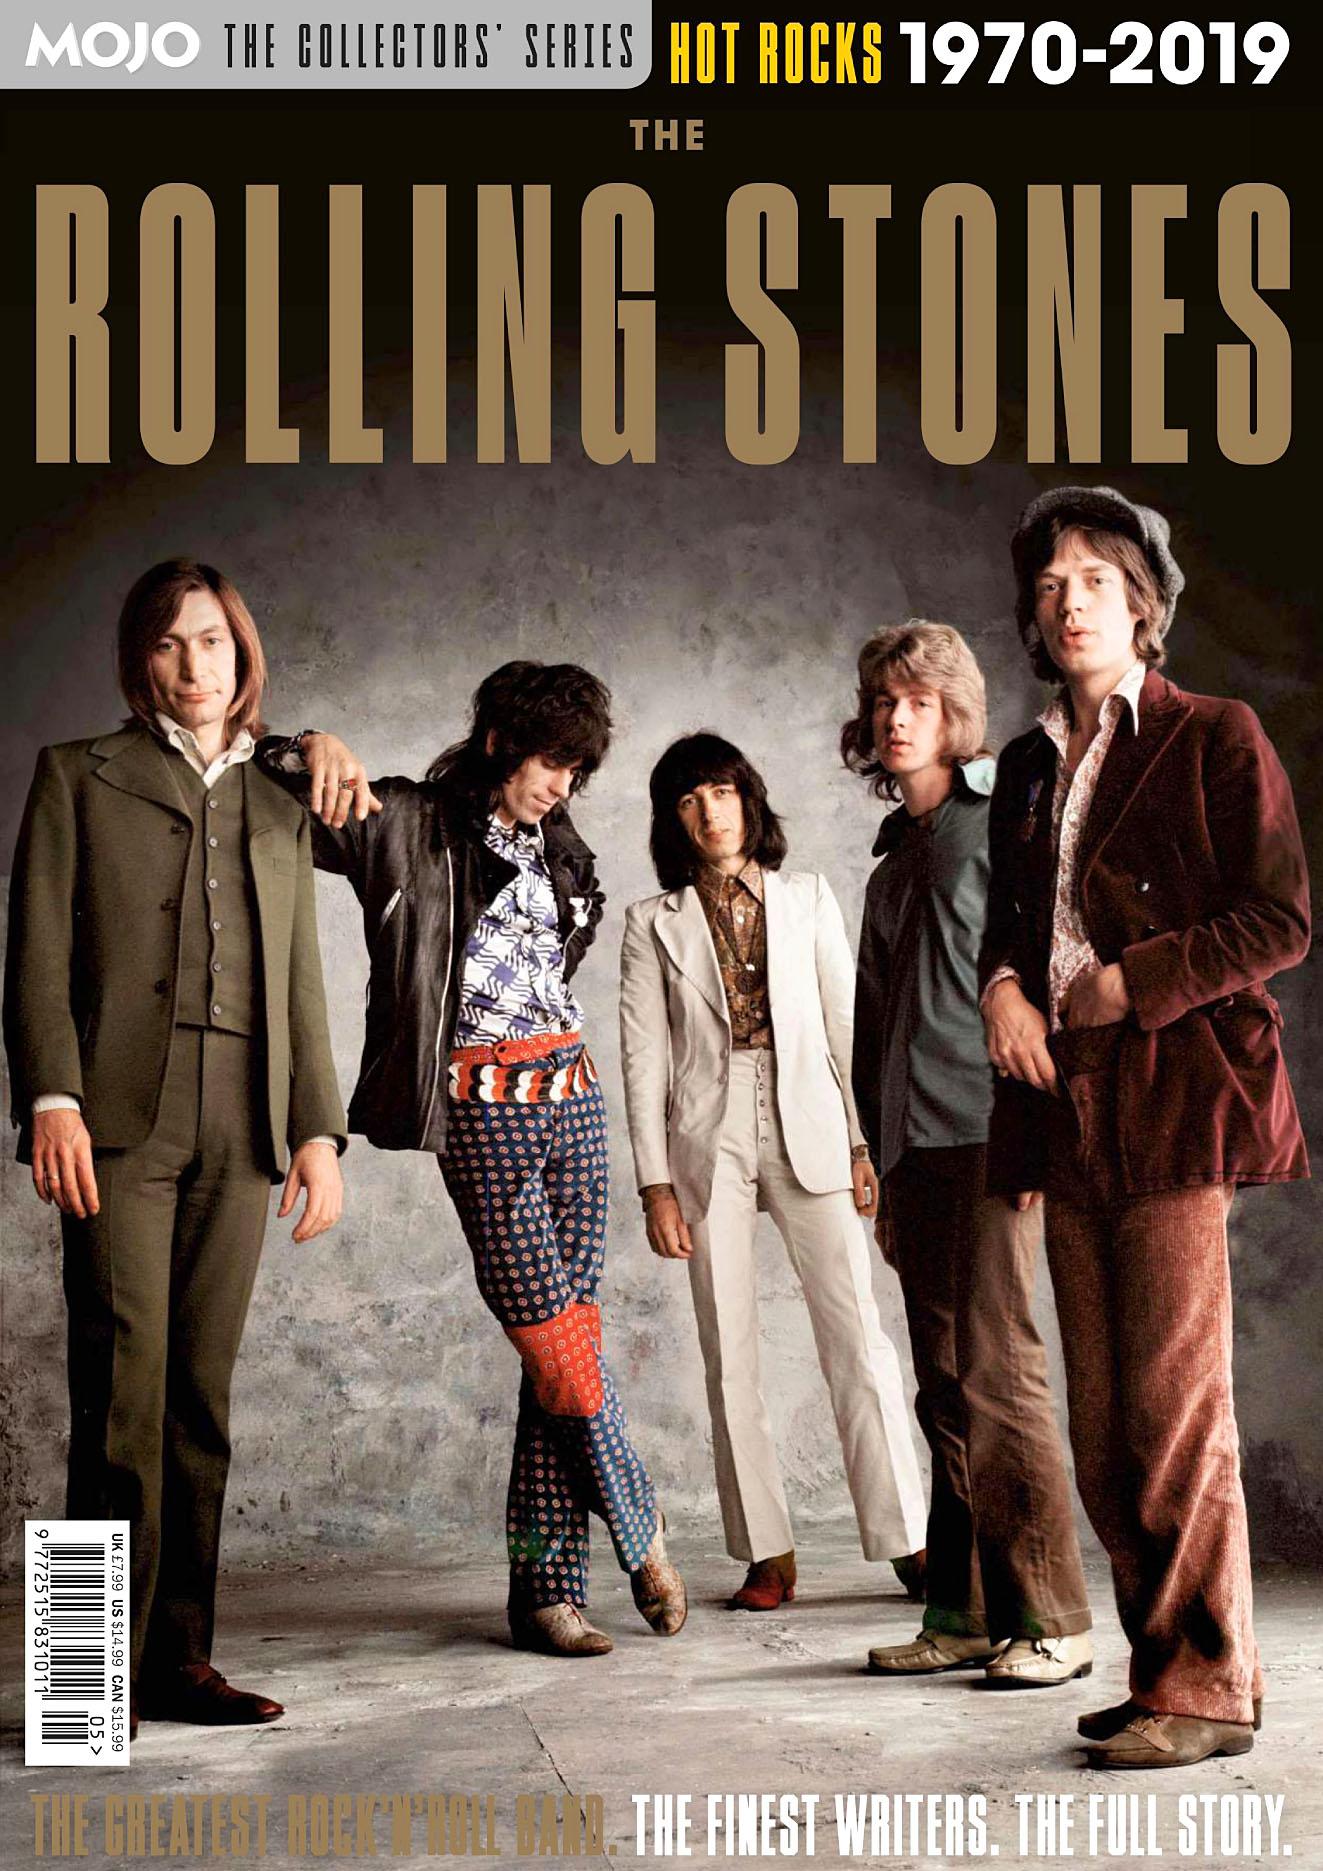 MOJO Sp Rolling Stones Part 2 2019.jpg